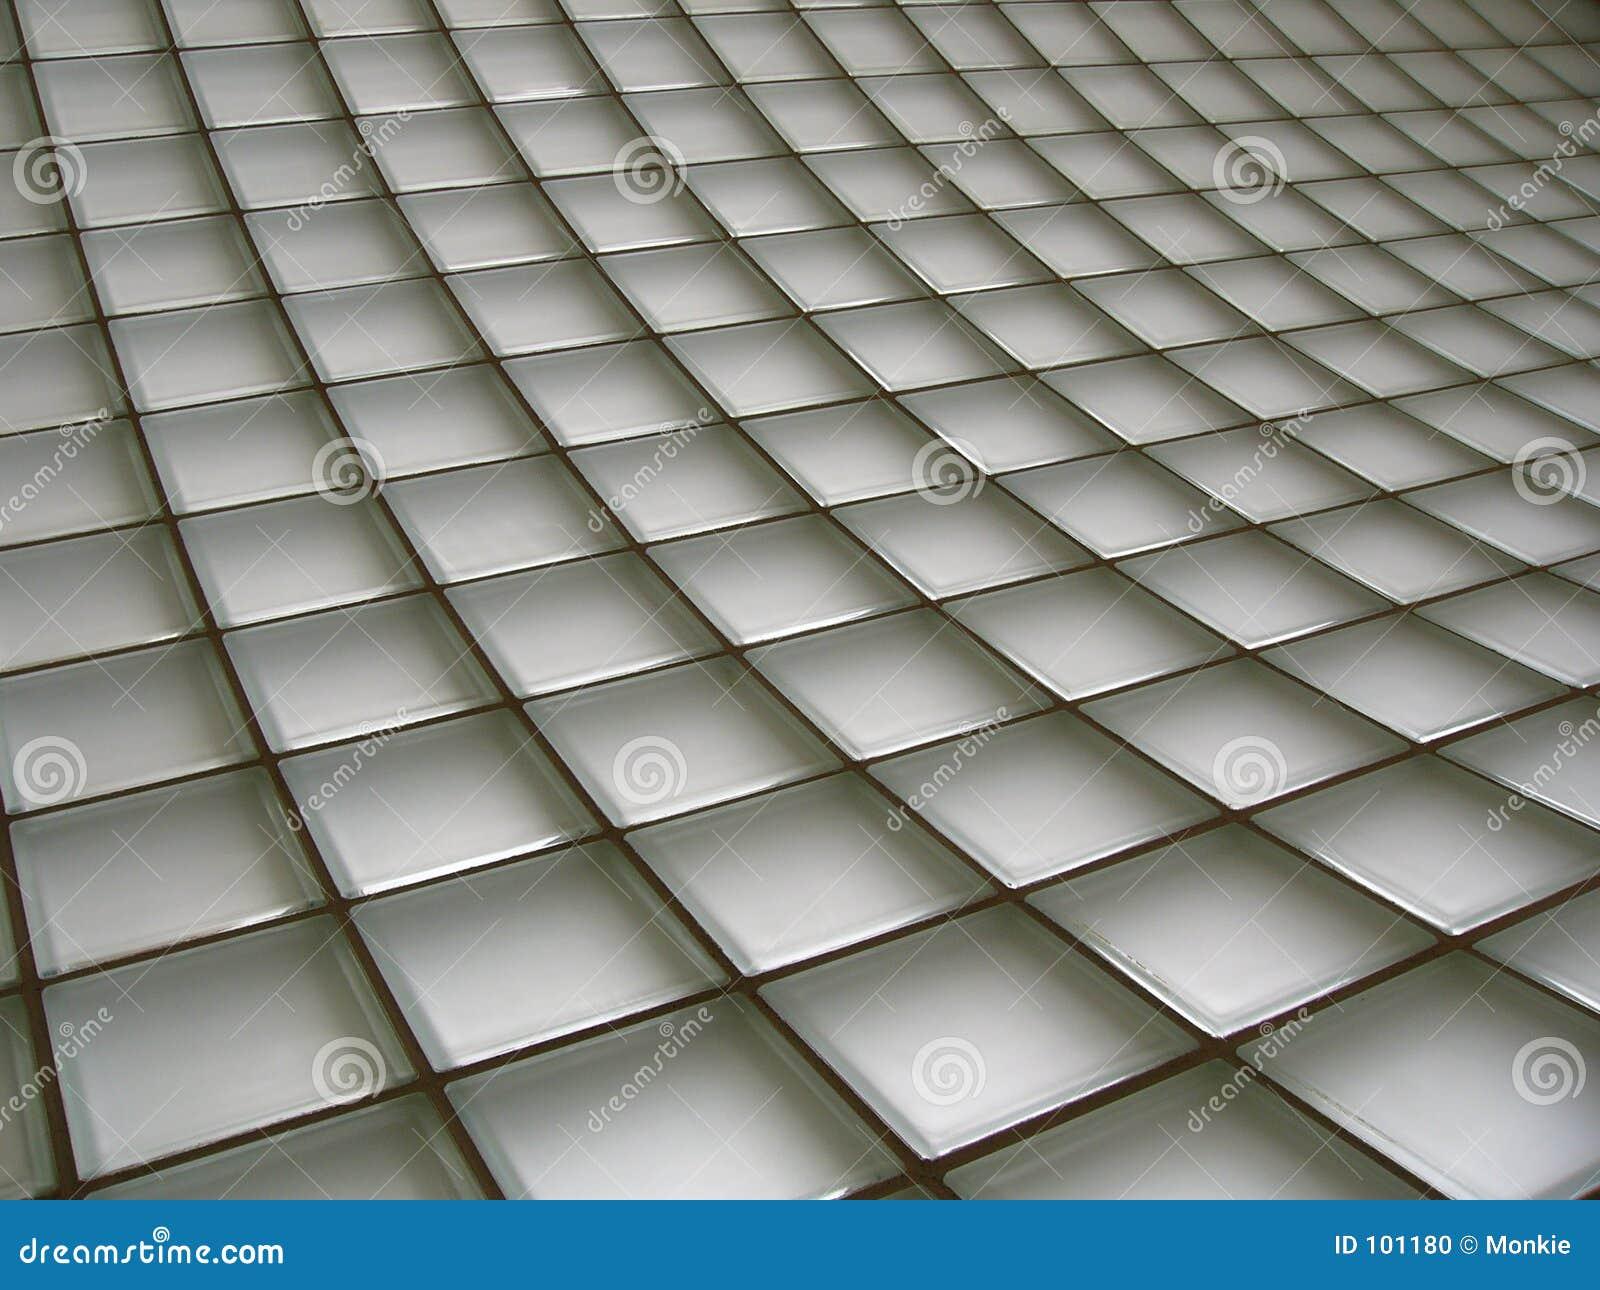 mur de briques en verre photo stock image 101180. Black Bedroom Furniture Sets. Home Design Ideas